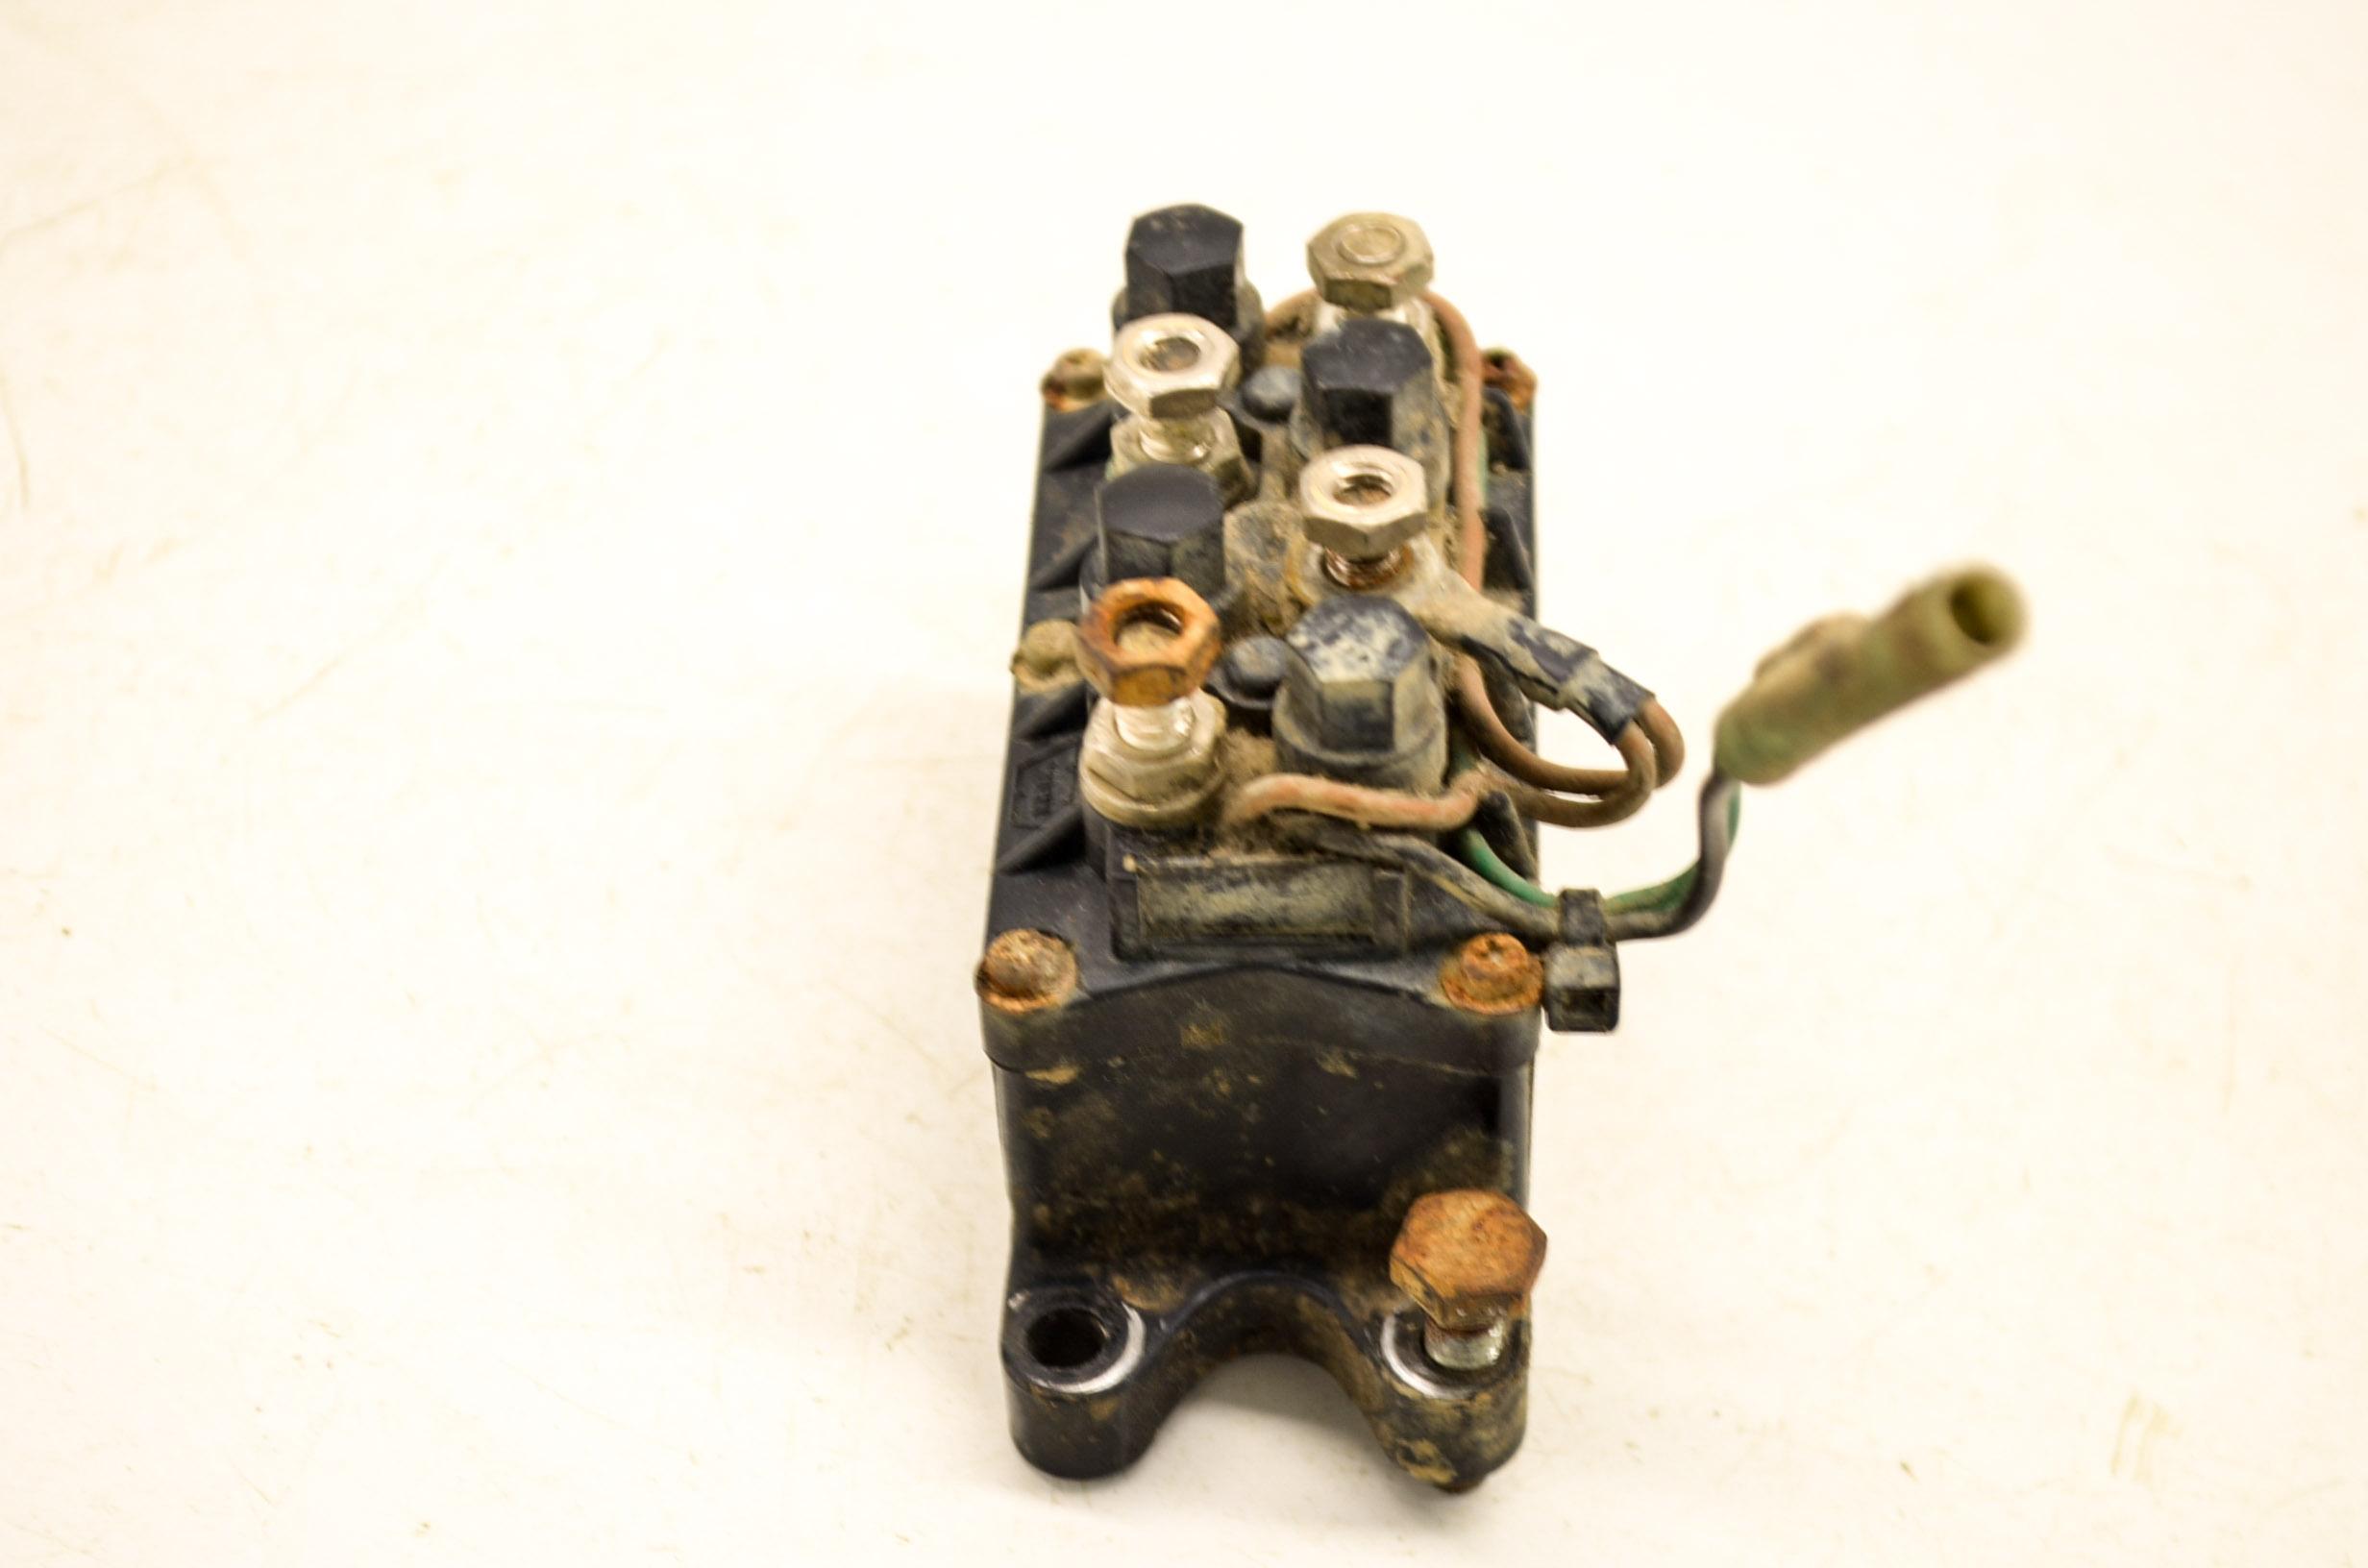 2003 honda rincon 650 wiring diagram wiring library 04 honda rincon 650 warn winch fuse box trx650fa 4x4 rh com 2003 honda